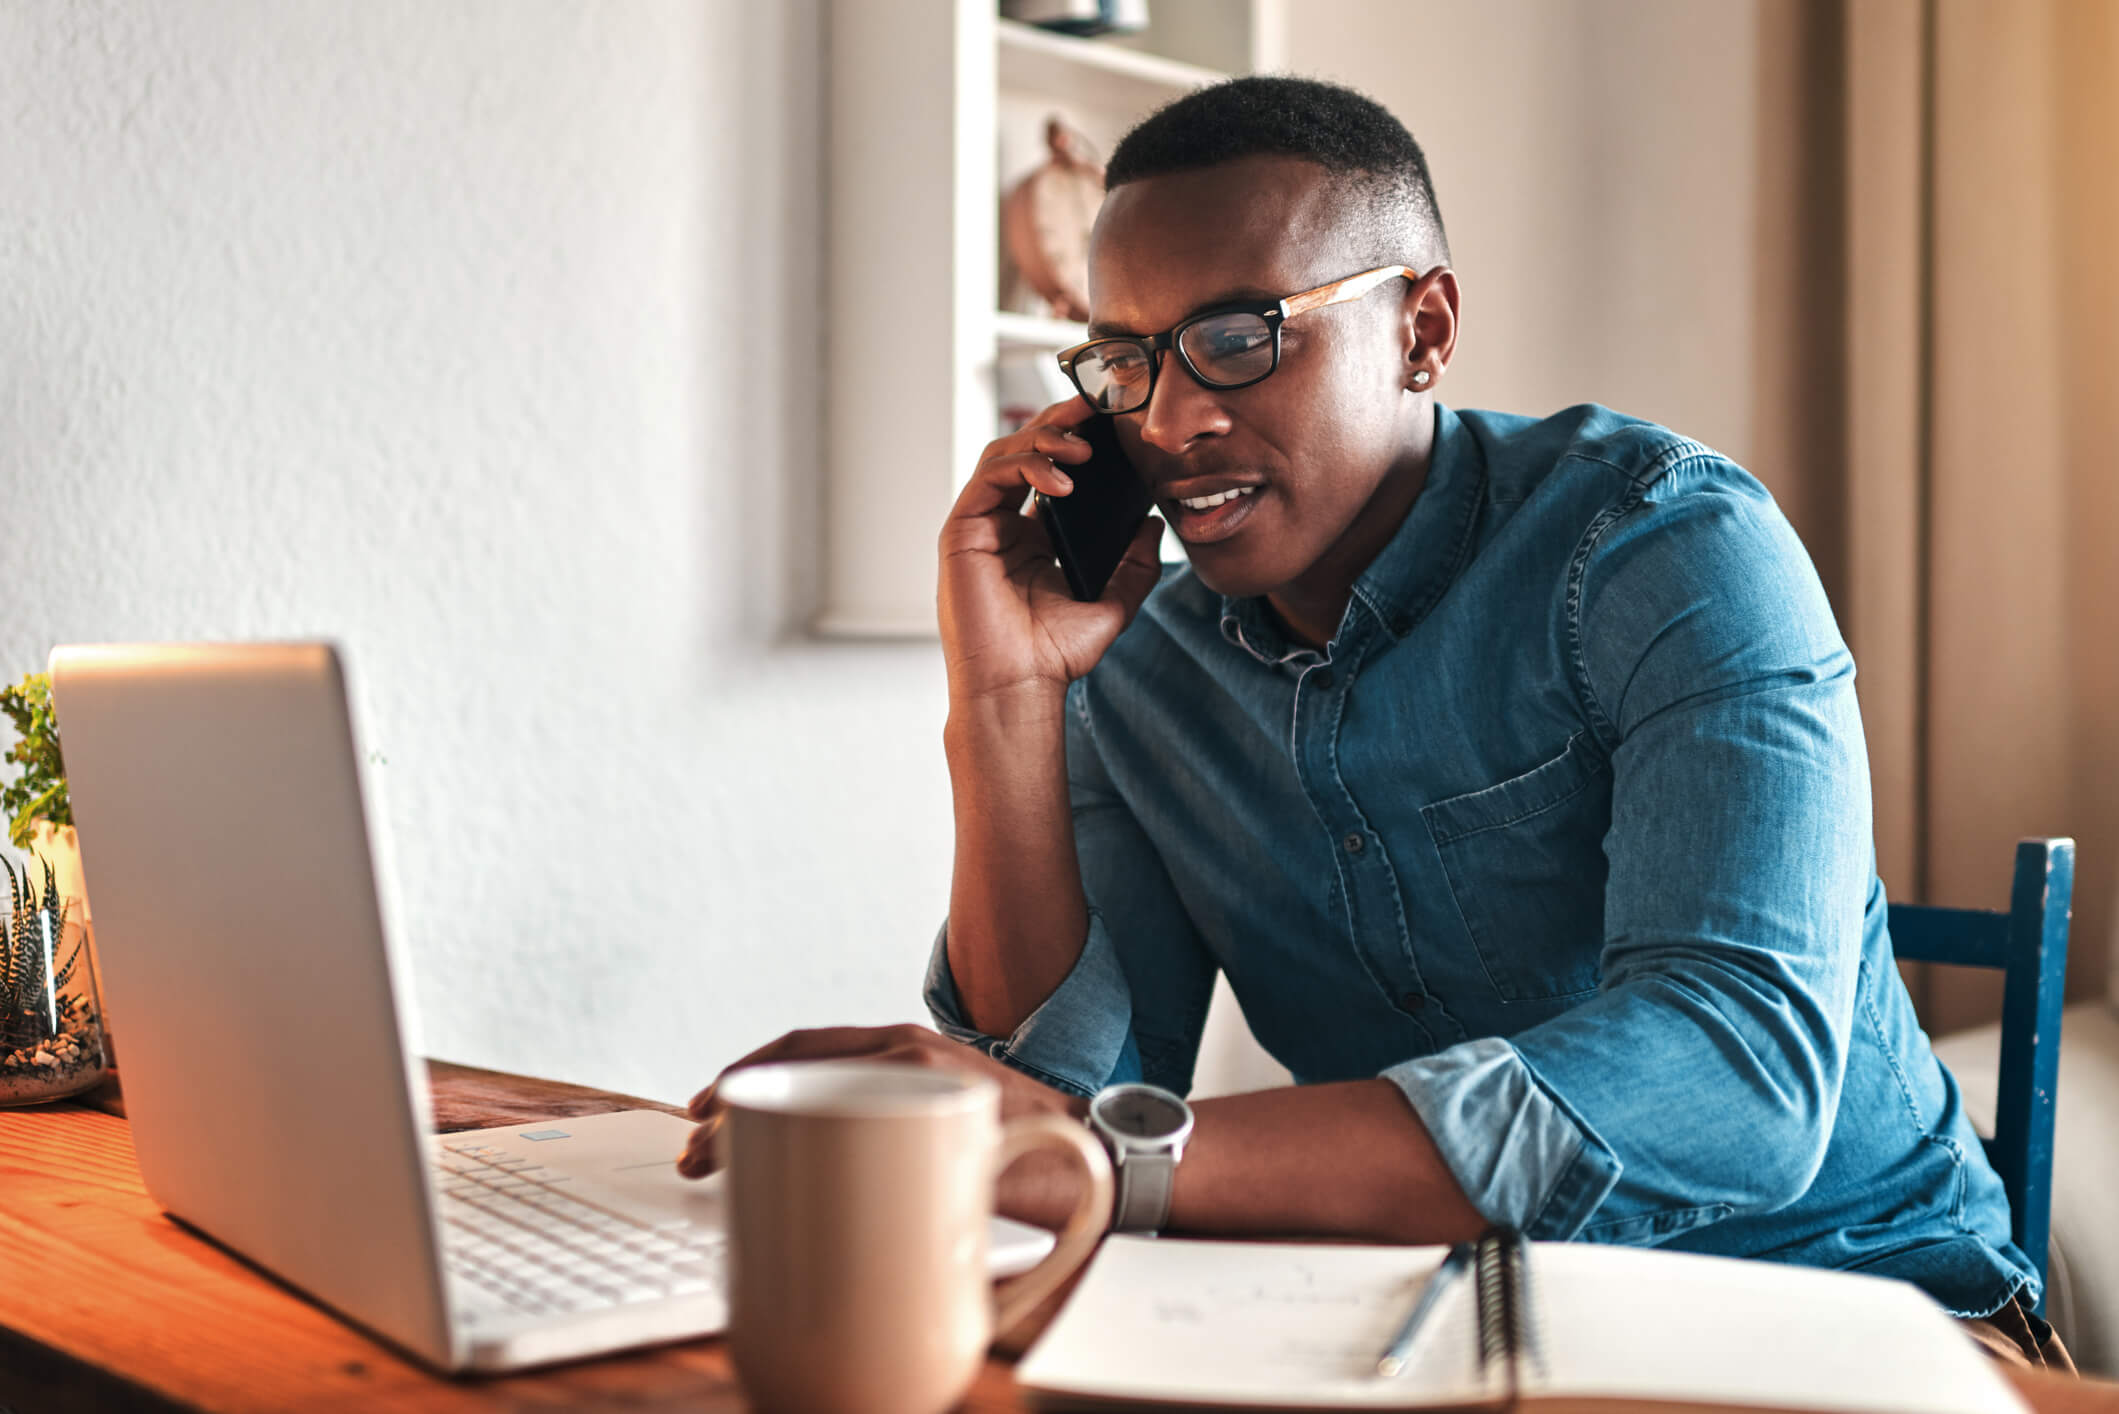 Man sitting at desk and calling Verizon customer service on his phone